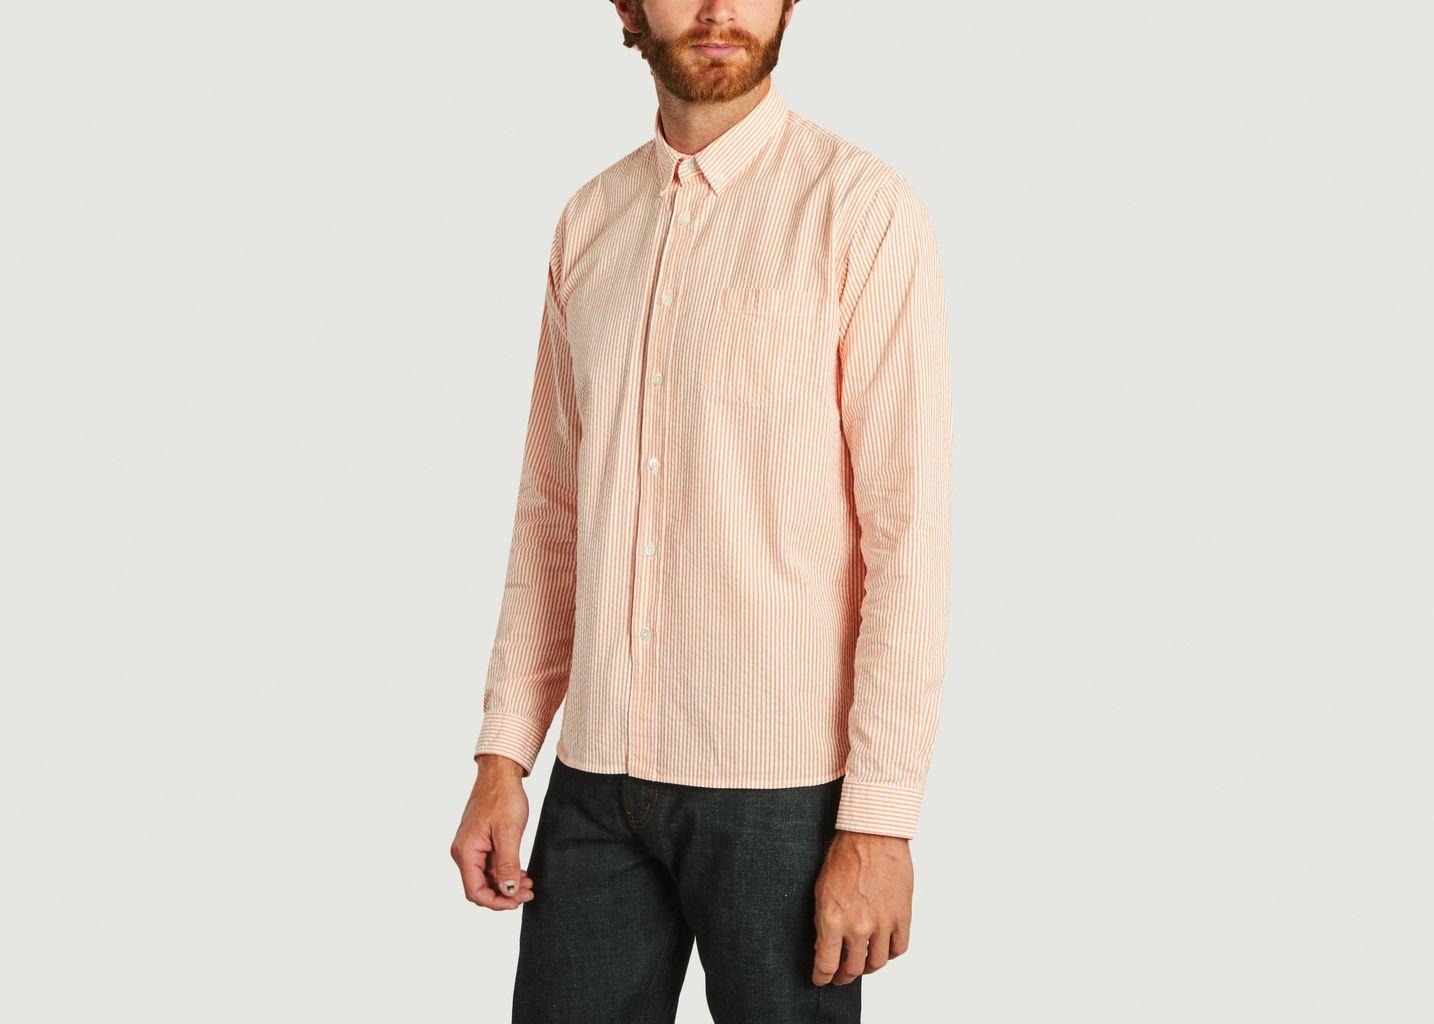 Chemise Branco rayée - La Paz